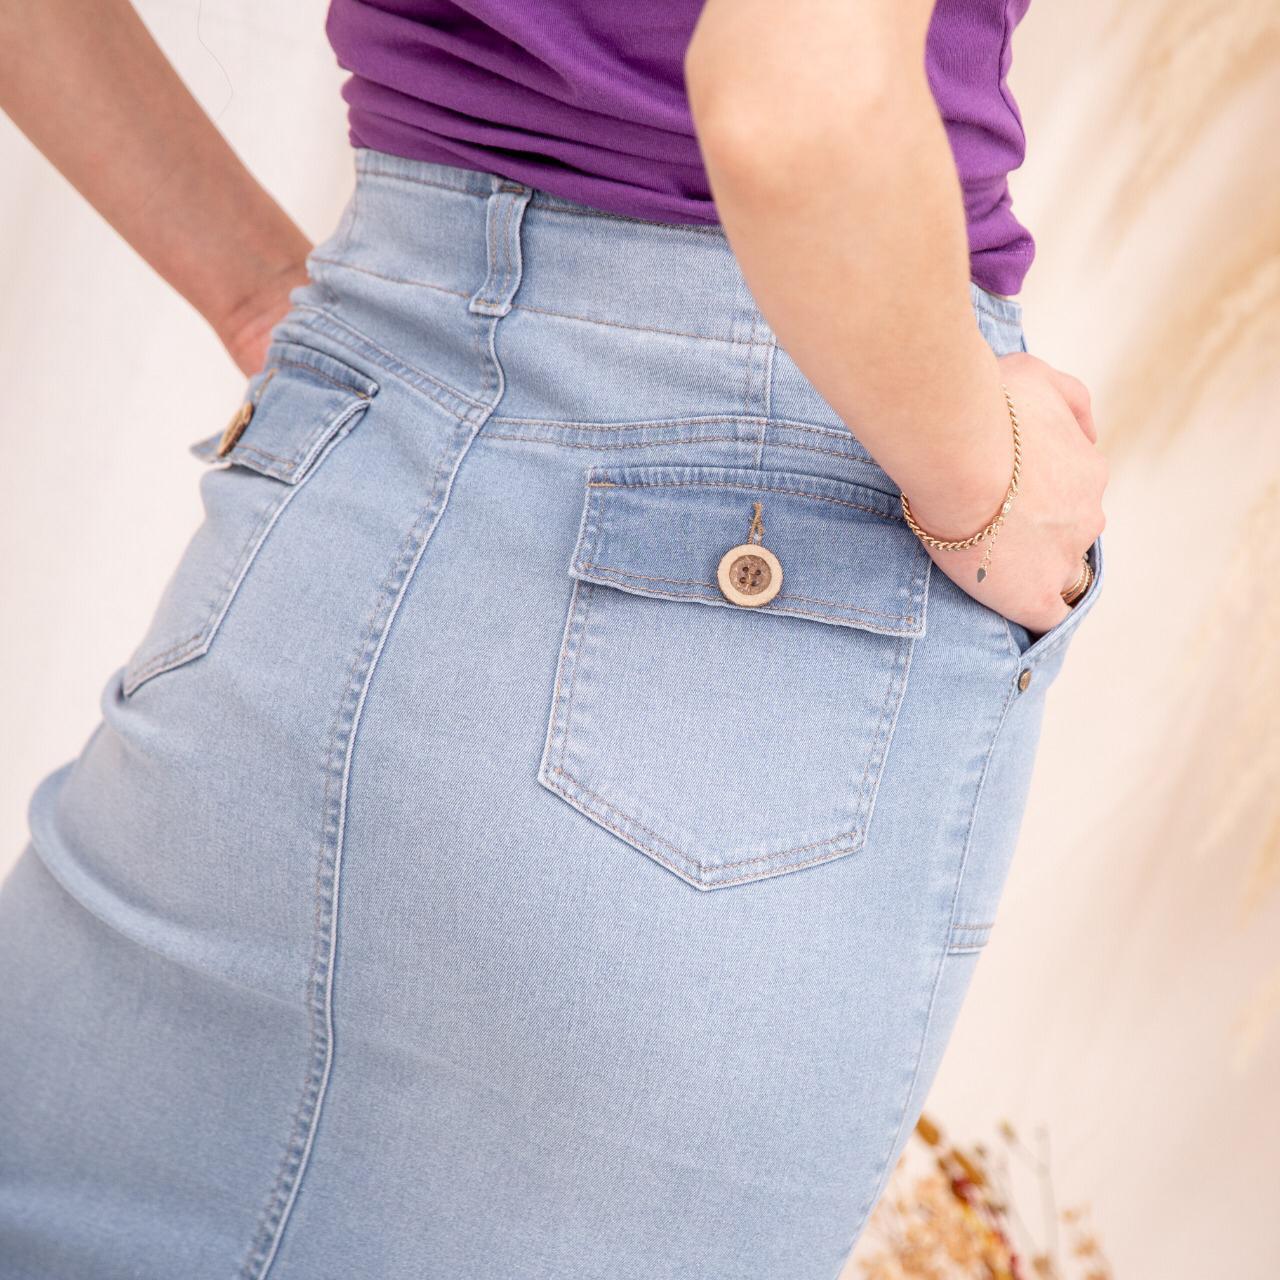 Pollera Jeans Cod. 1190052